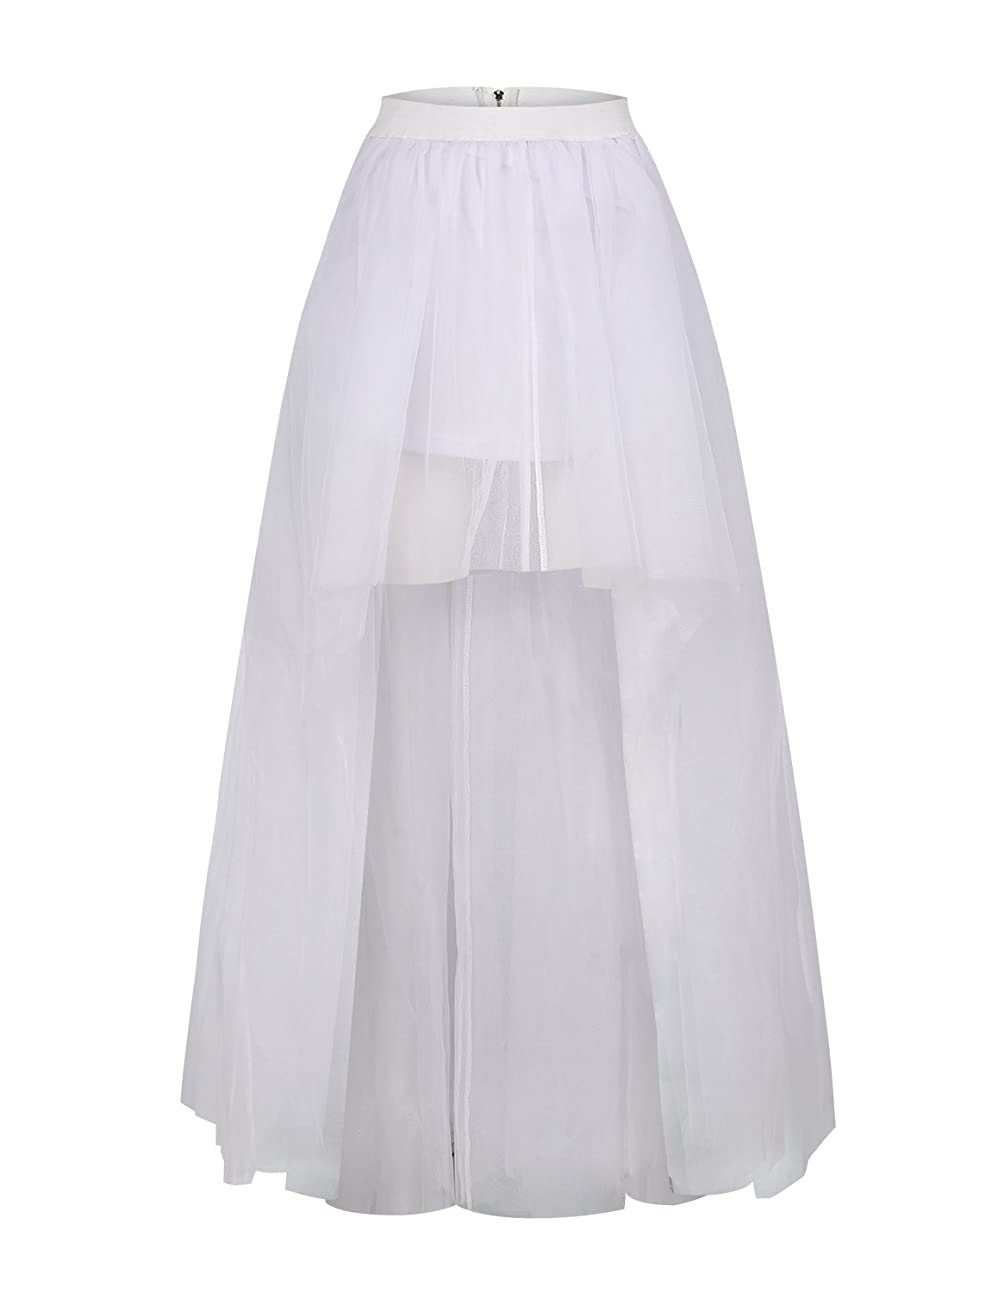 9fc9ad1acb Leslie Brown · HaoDuoYi Womens Tulle TuTu High Low High Waist Princess  Wedding Skirt